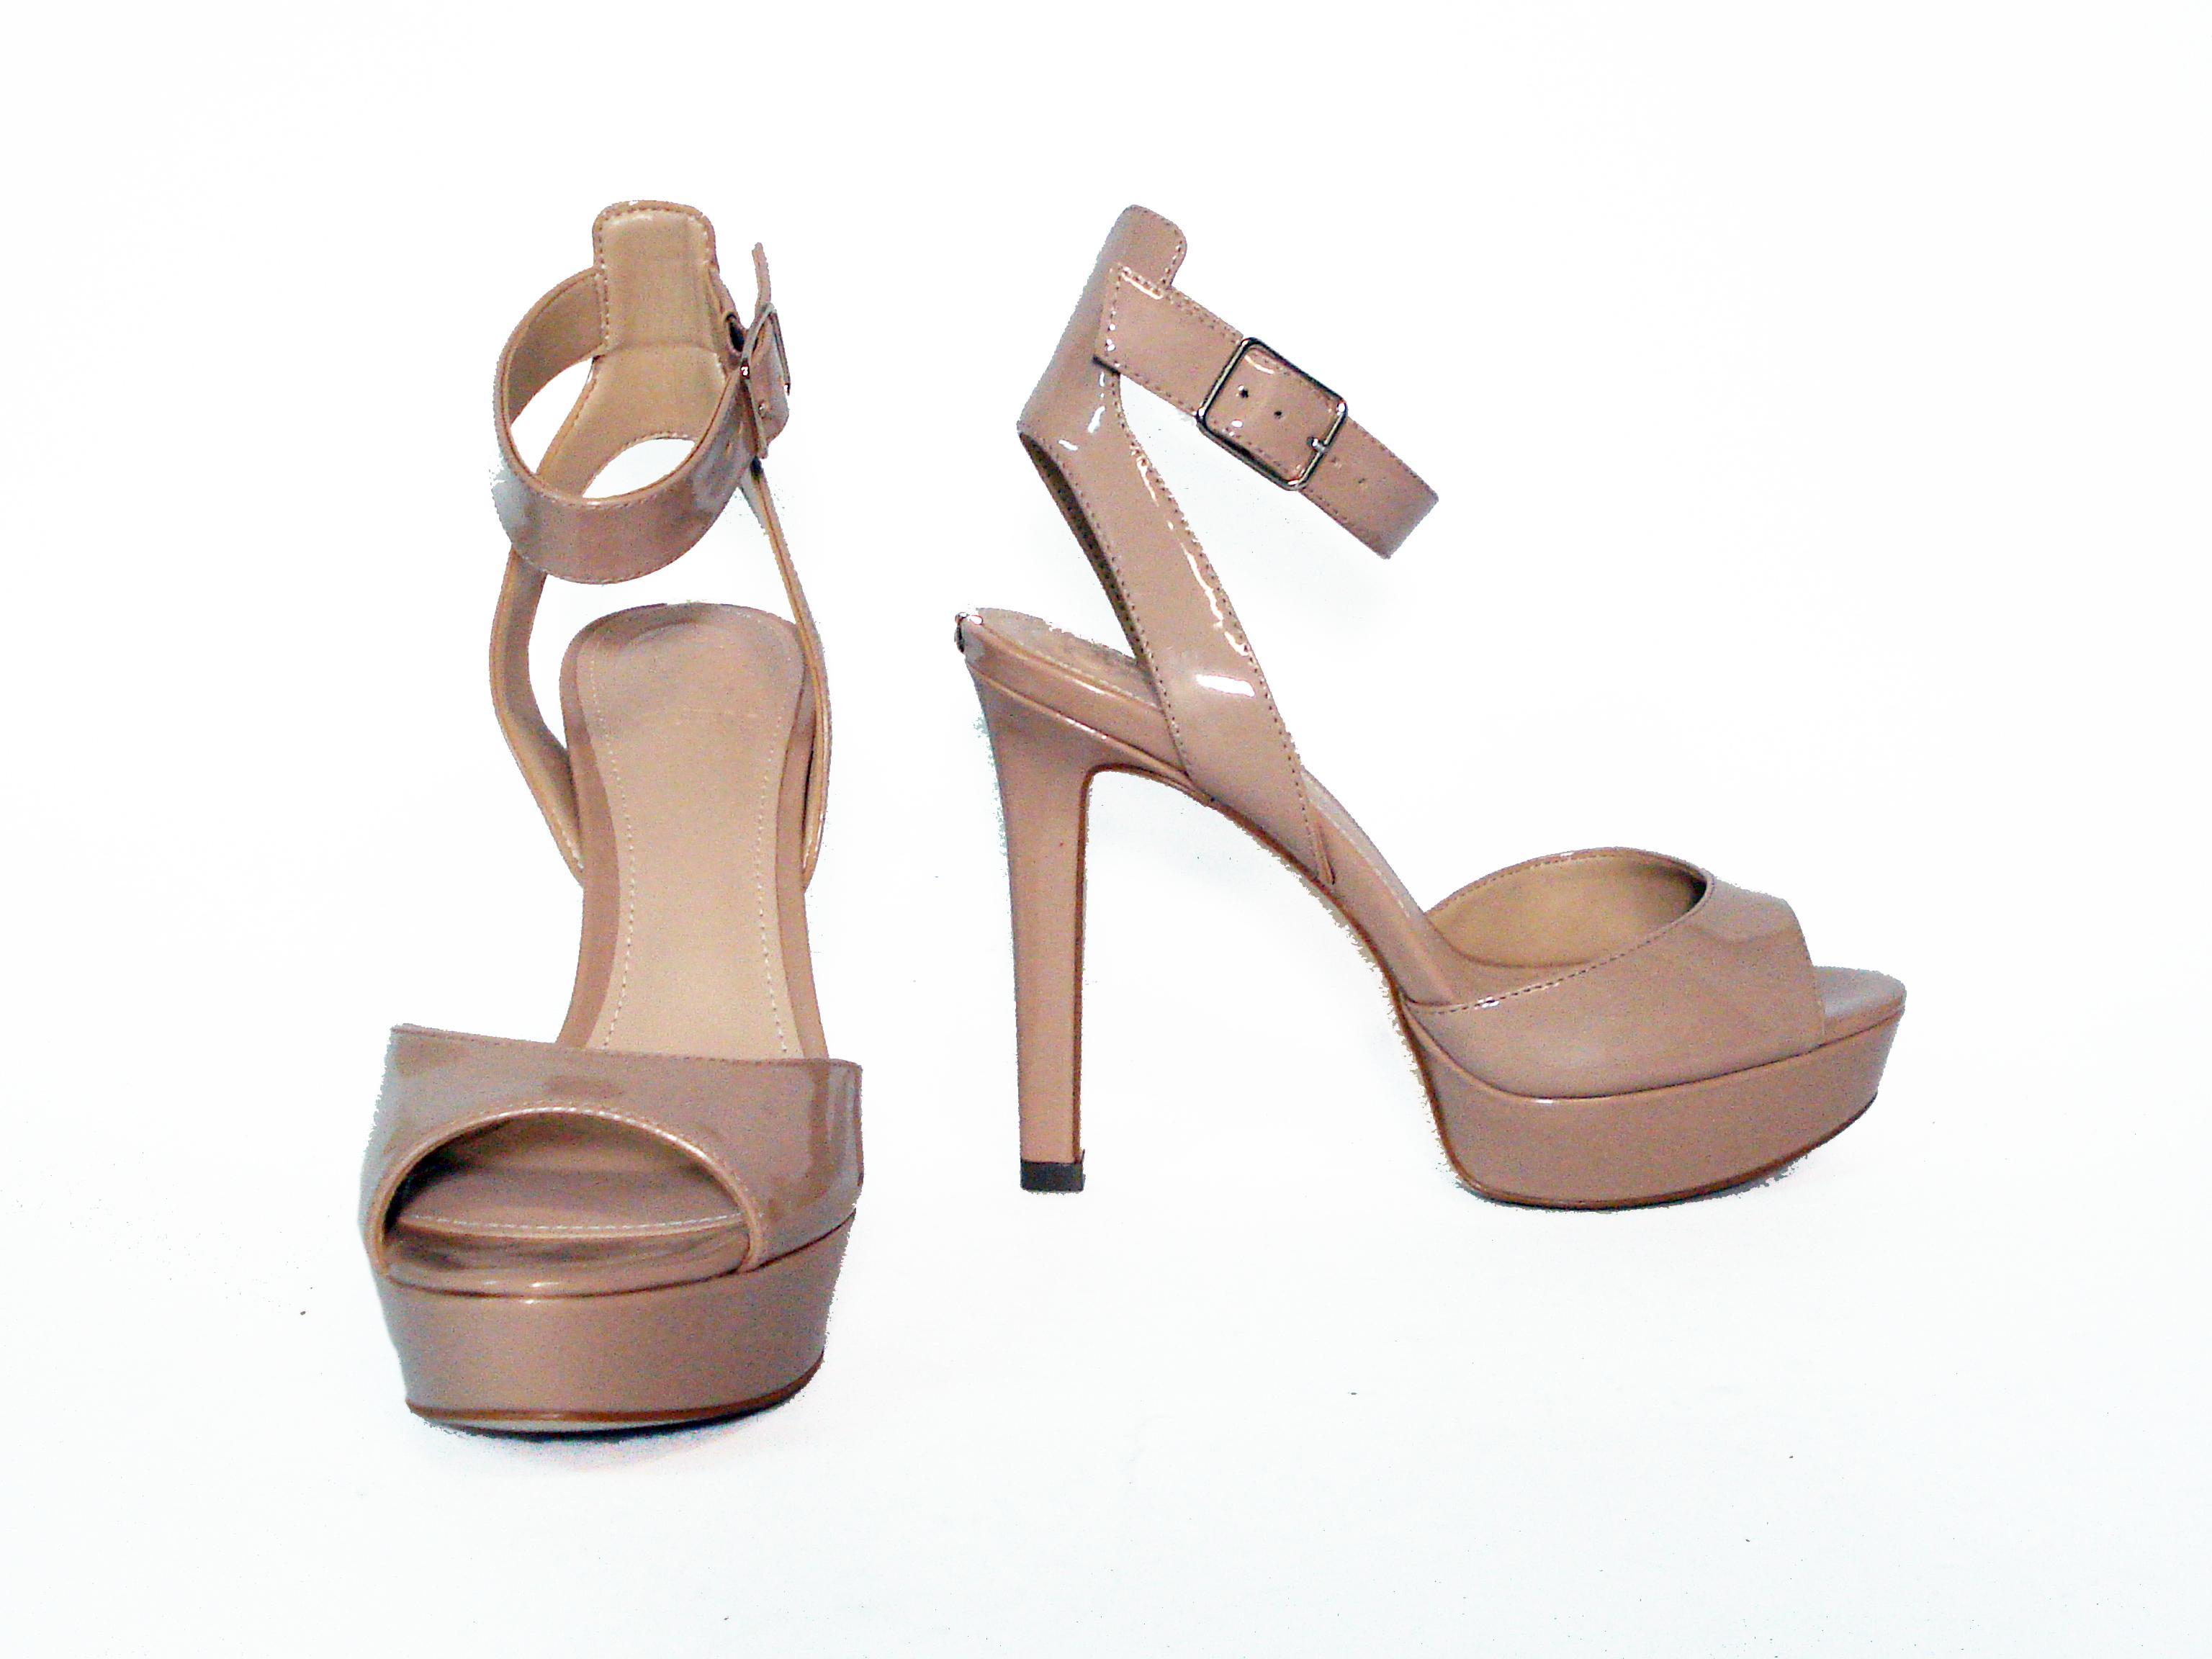 Sandalo spuntato nude Guess